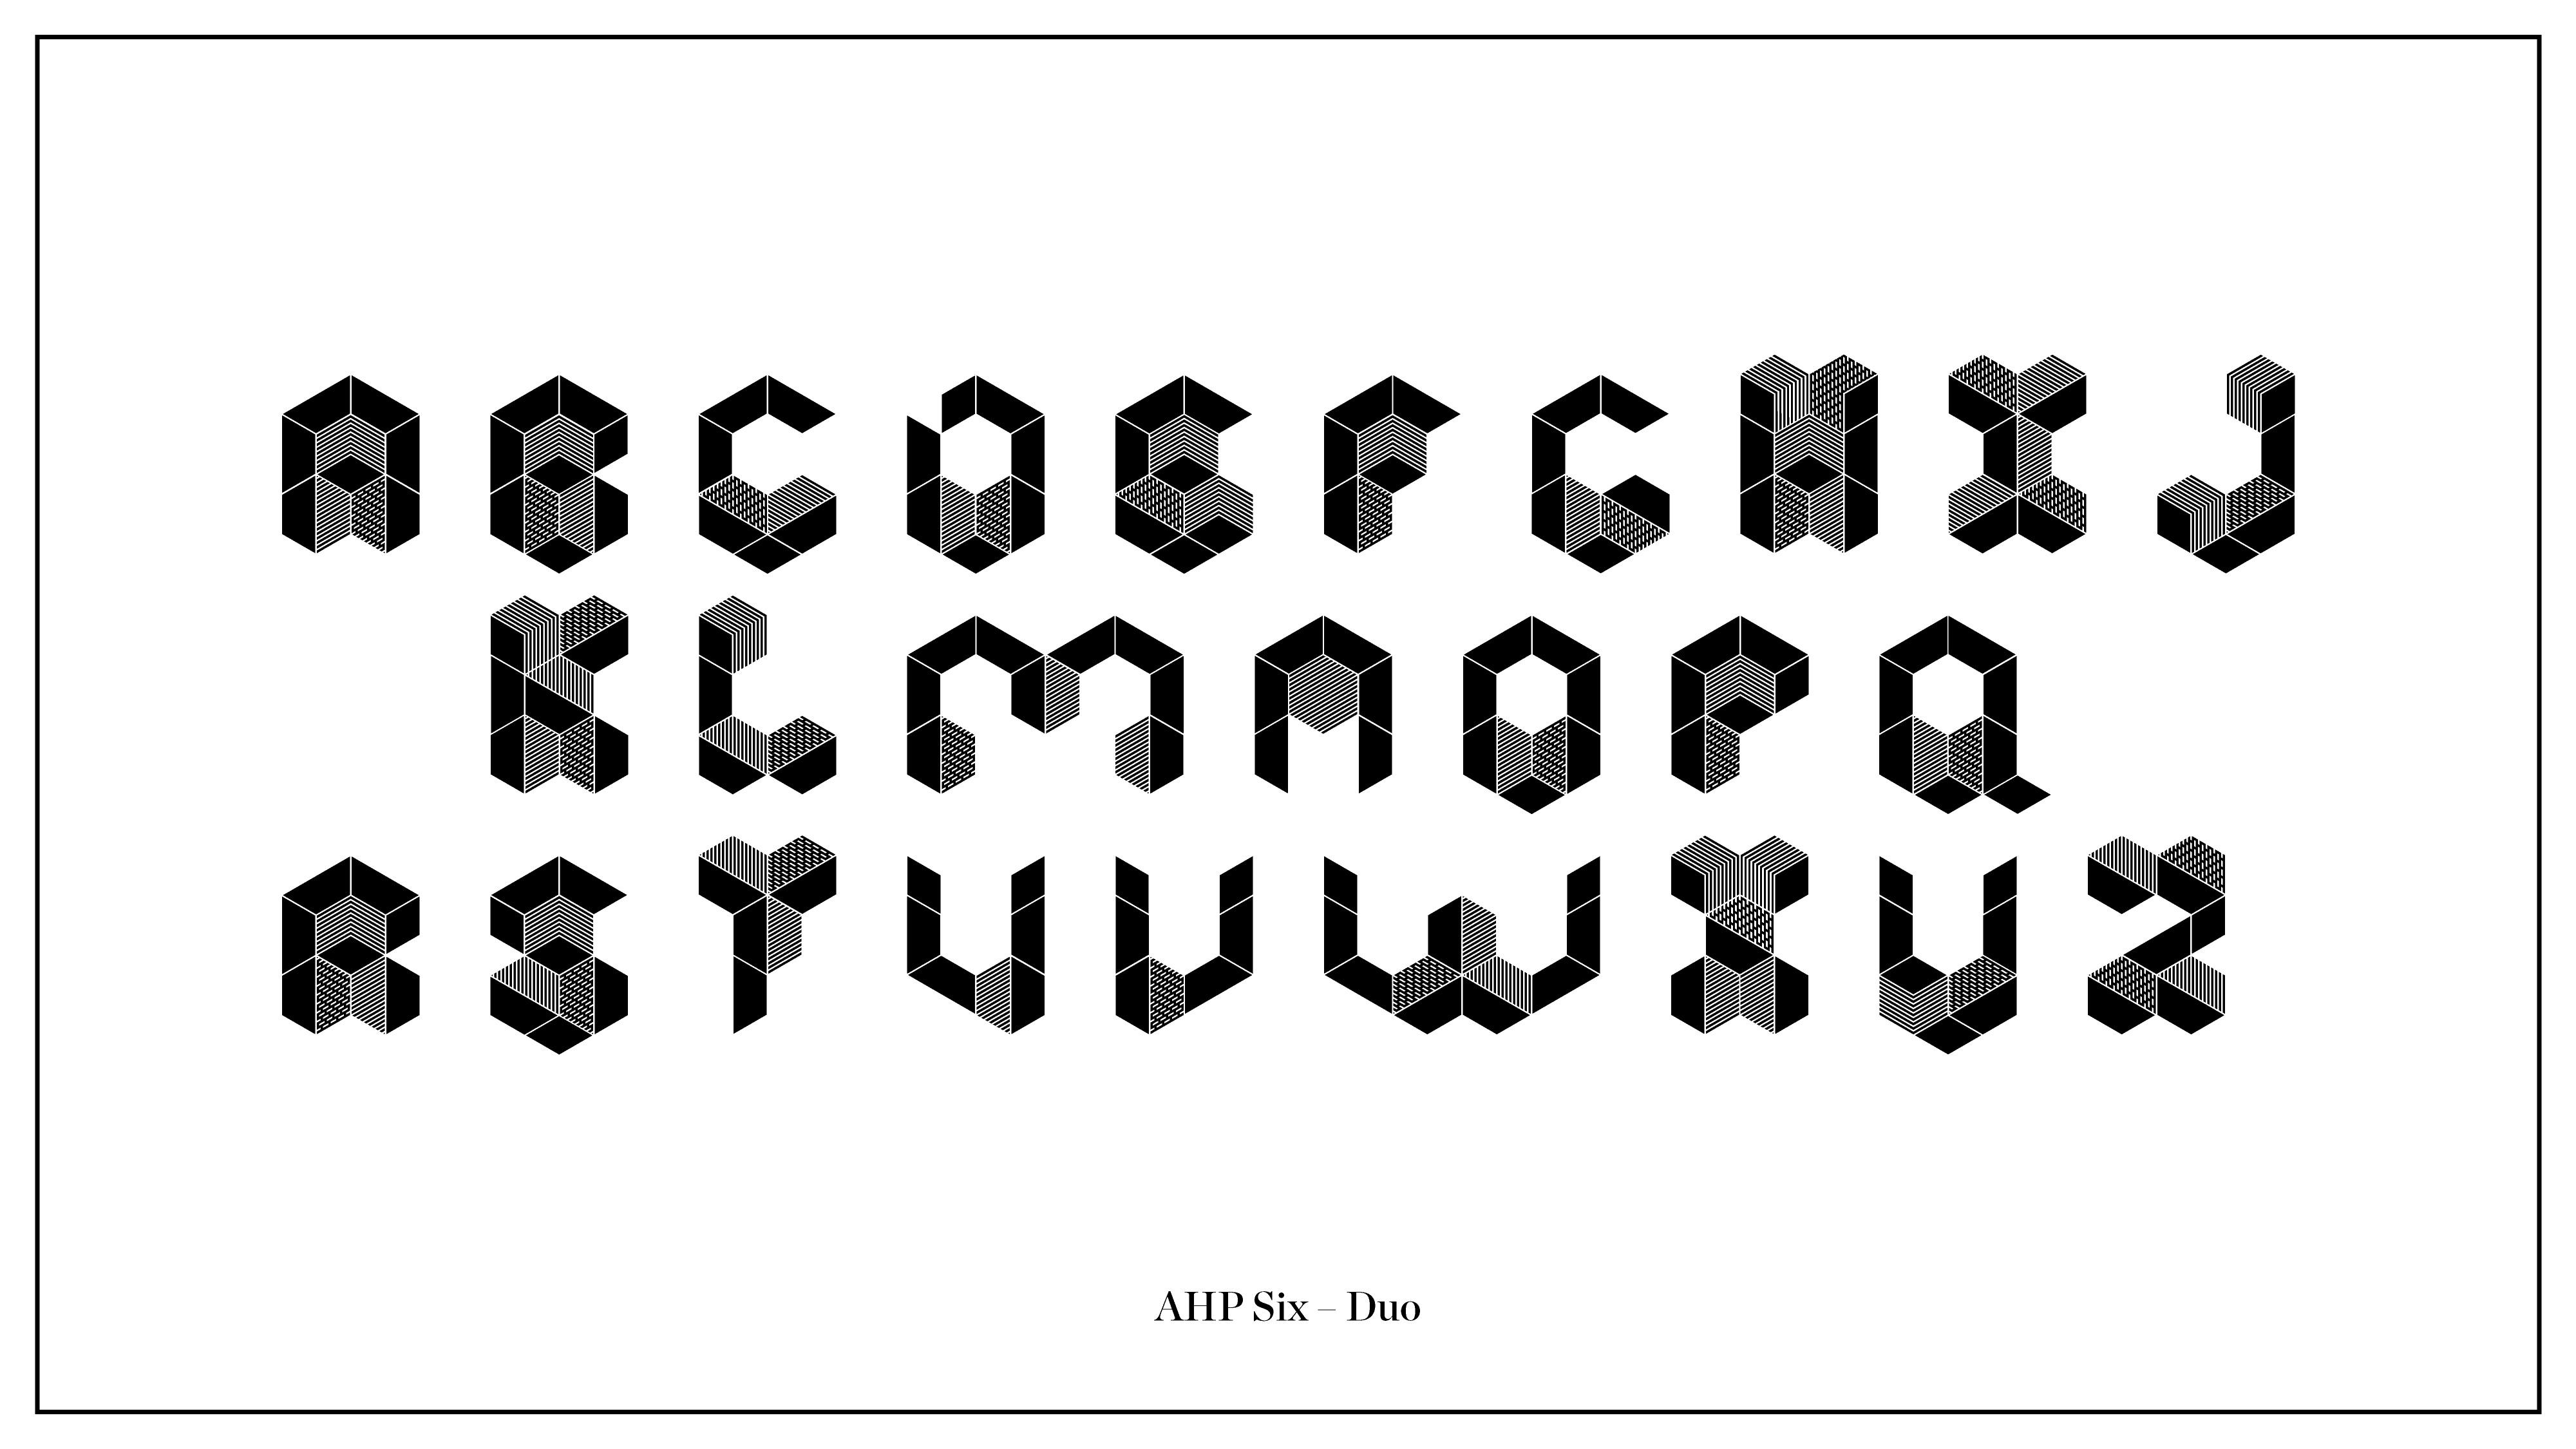 AHP_Type_Duo